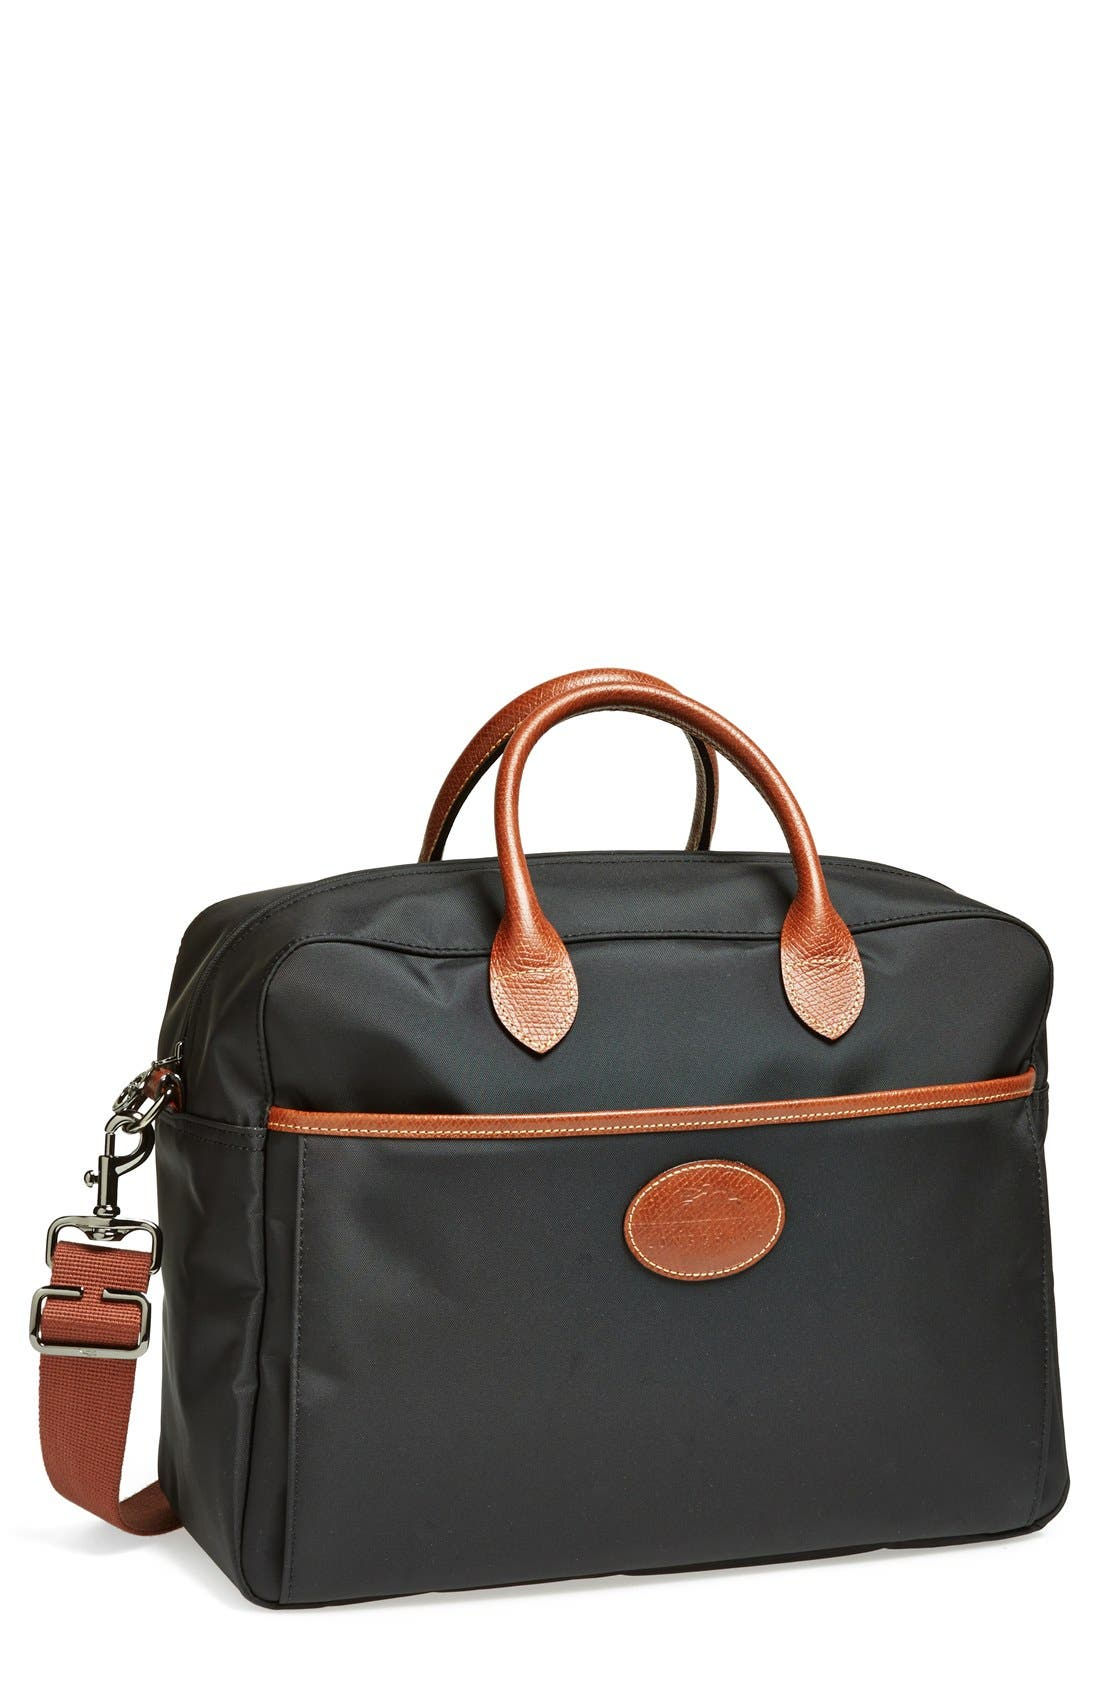 Main Image - Longchamp 'Le Pliage' Travel Bag (14 Inch)